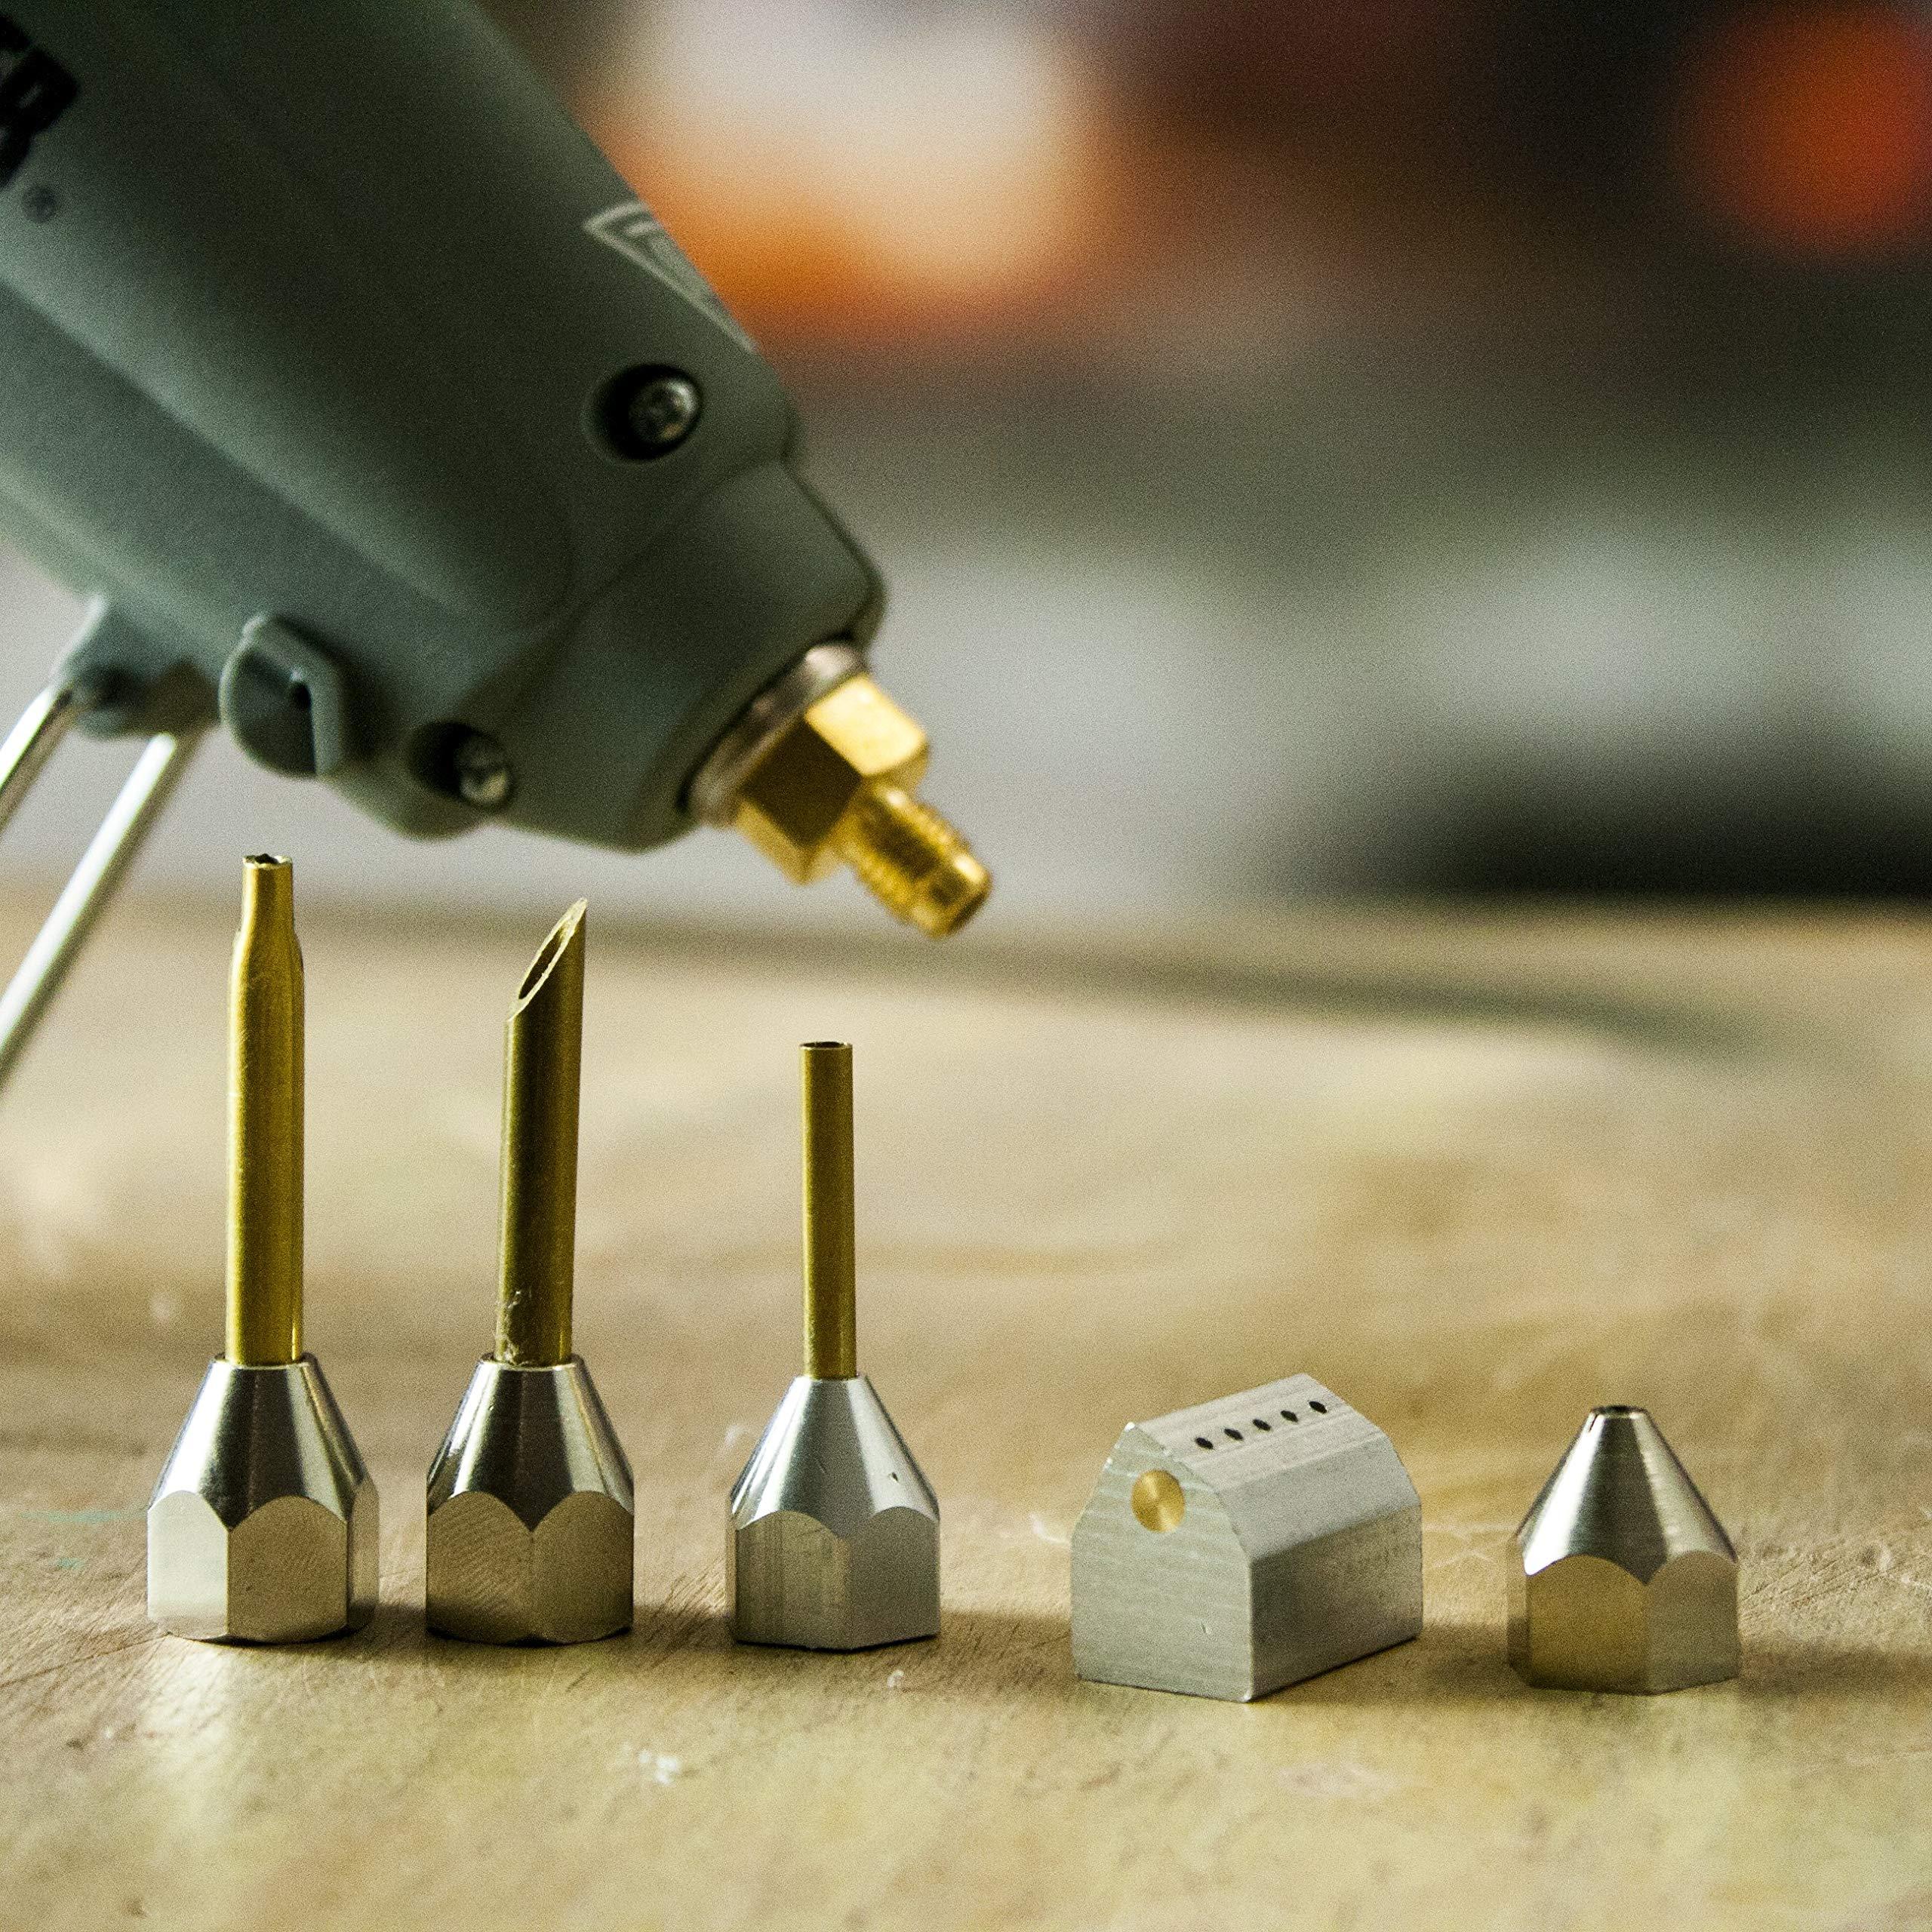 100SET Specialty Nozzle Assortment for Pro Series Hot Glue Guns